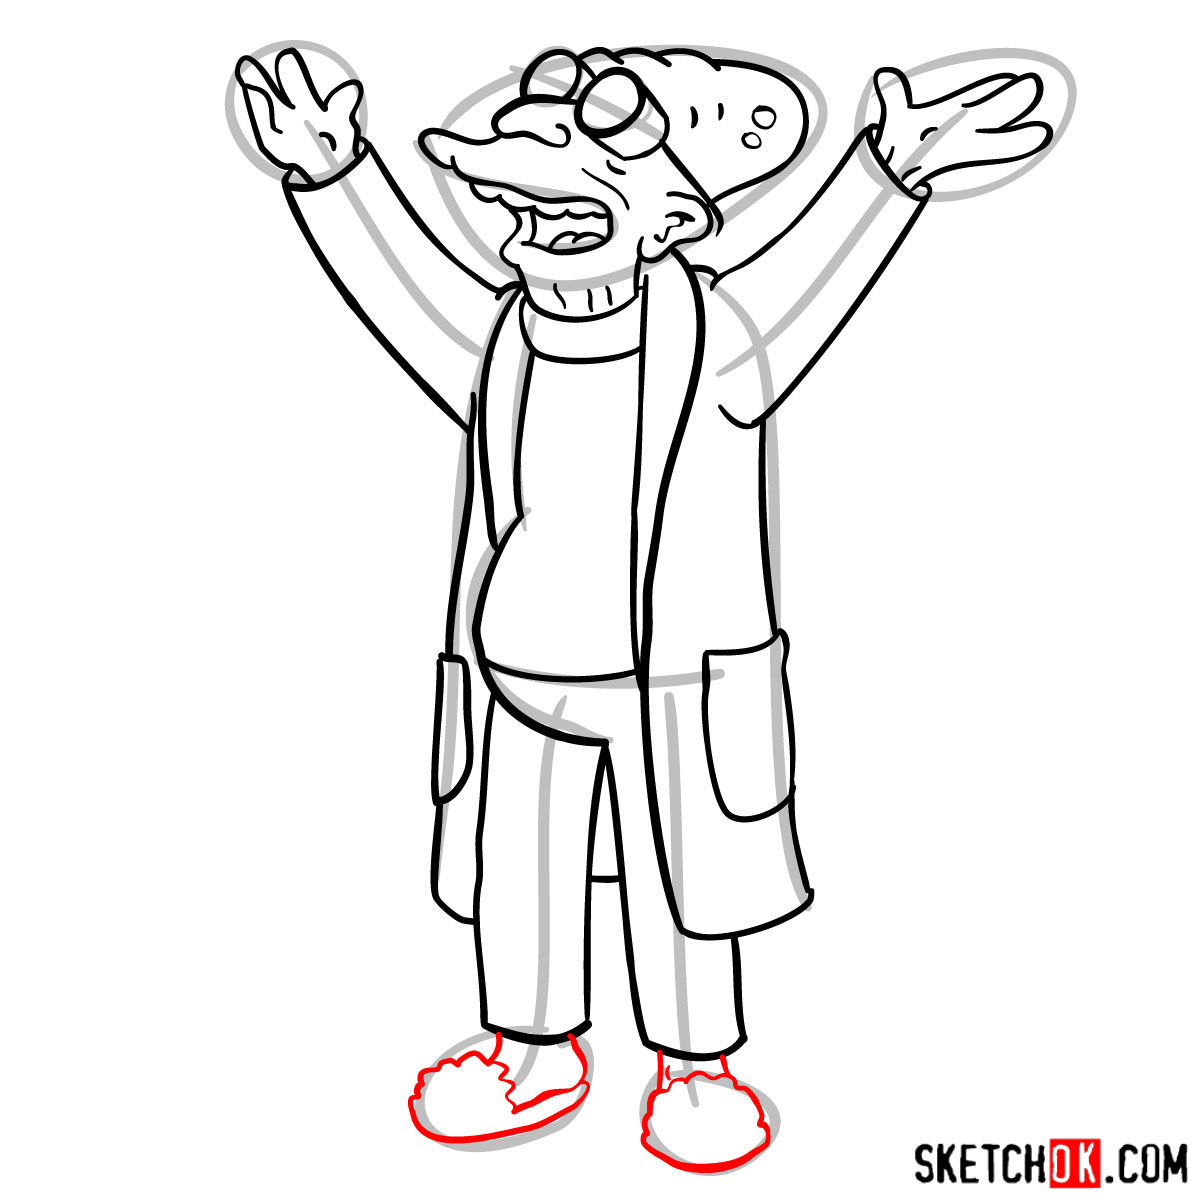 1200x1200 How To Draw Professor Farnsworth